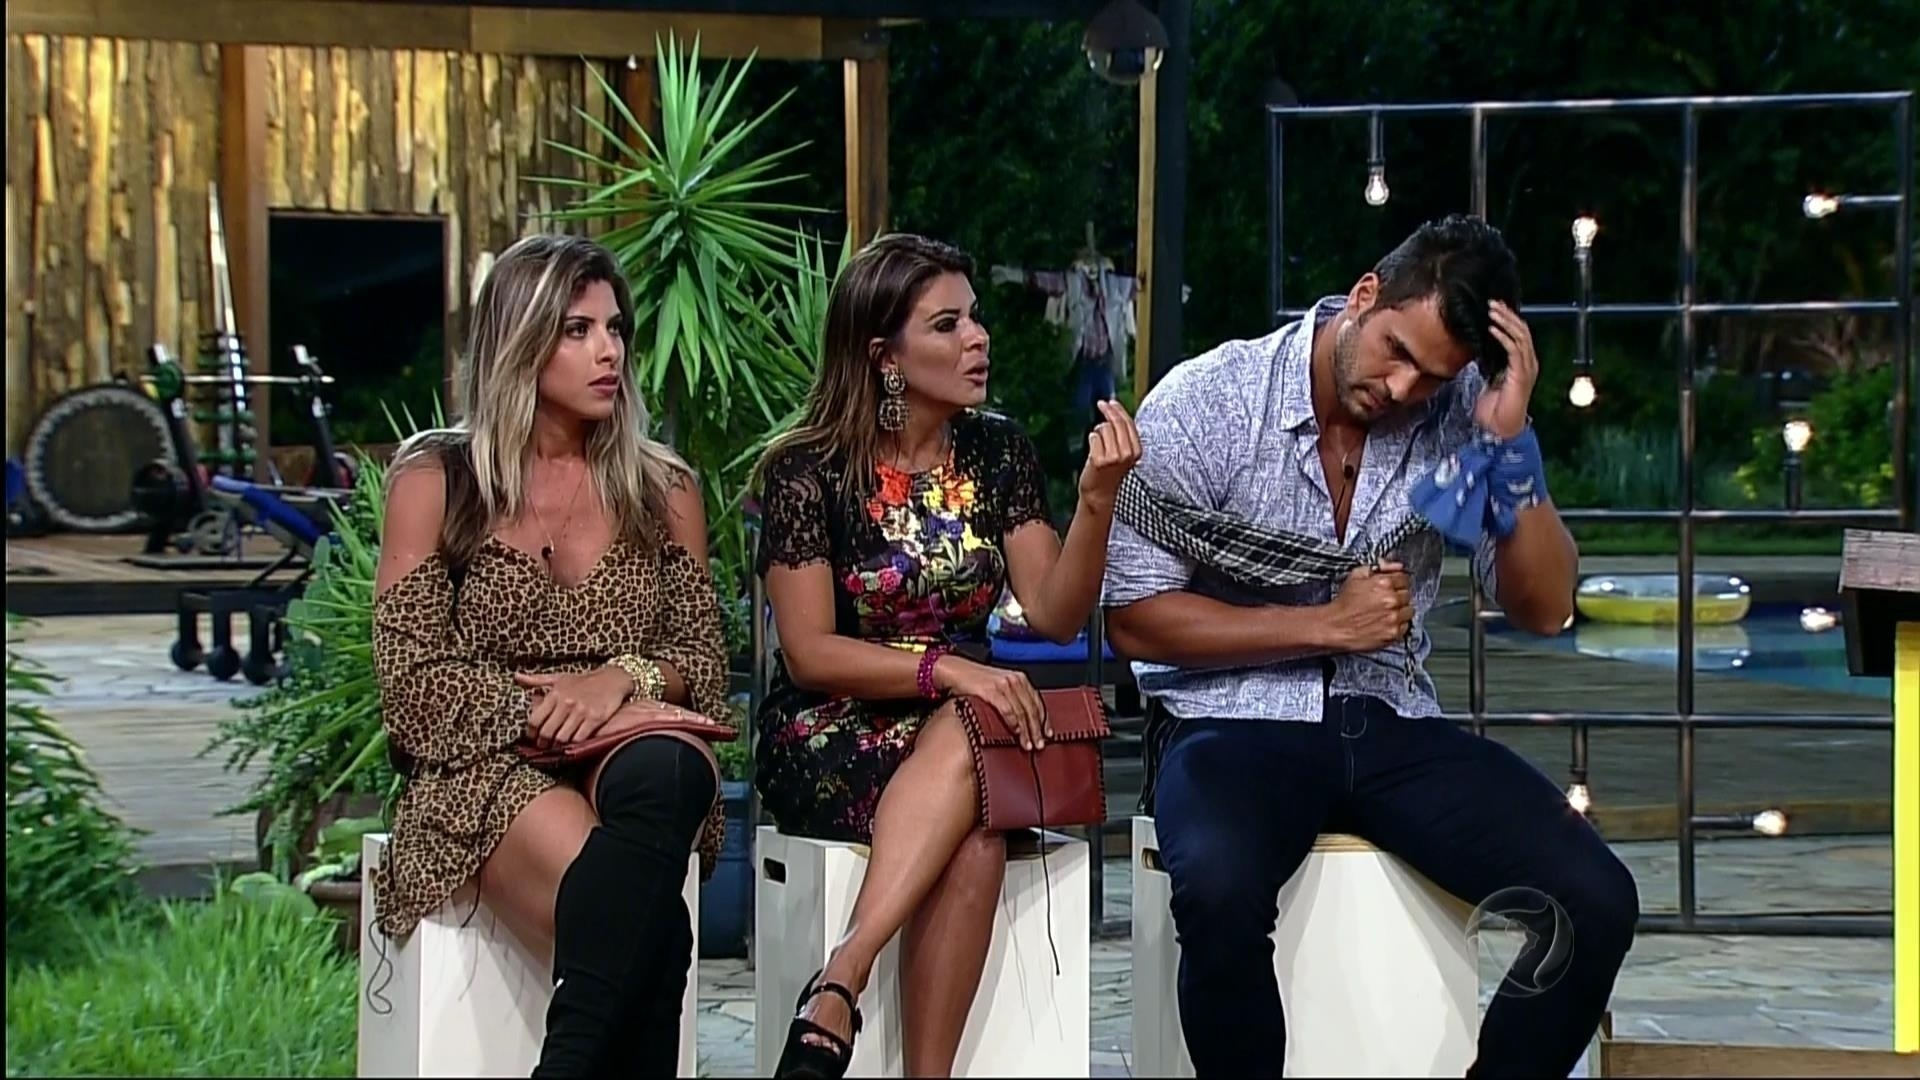 24.nov.2015 -Ana Paula Minerato, Mara Maravilha e Marcelo Bimbi se enfrentarão na prova do fazendeiro